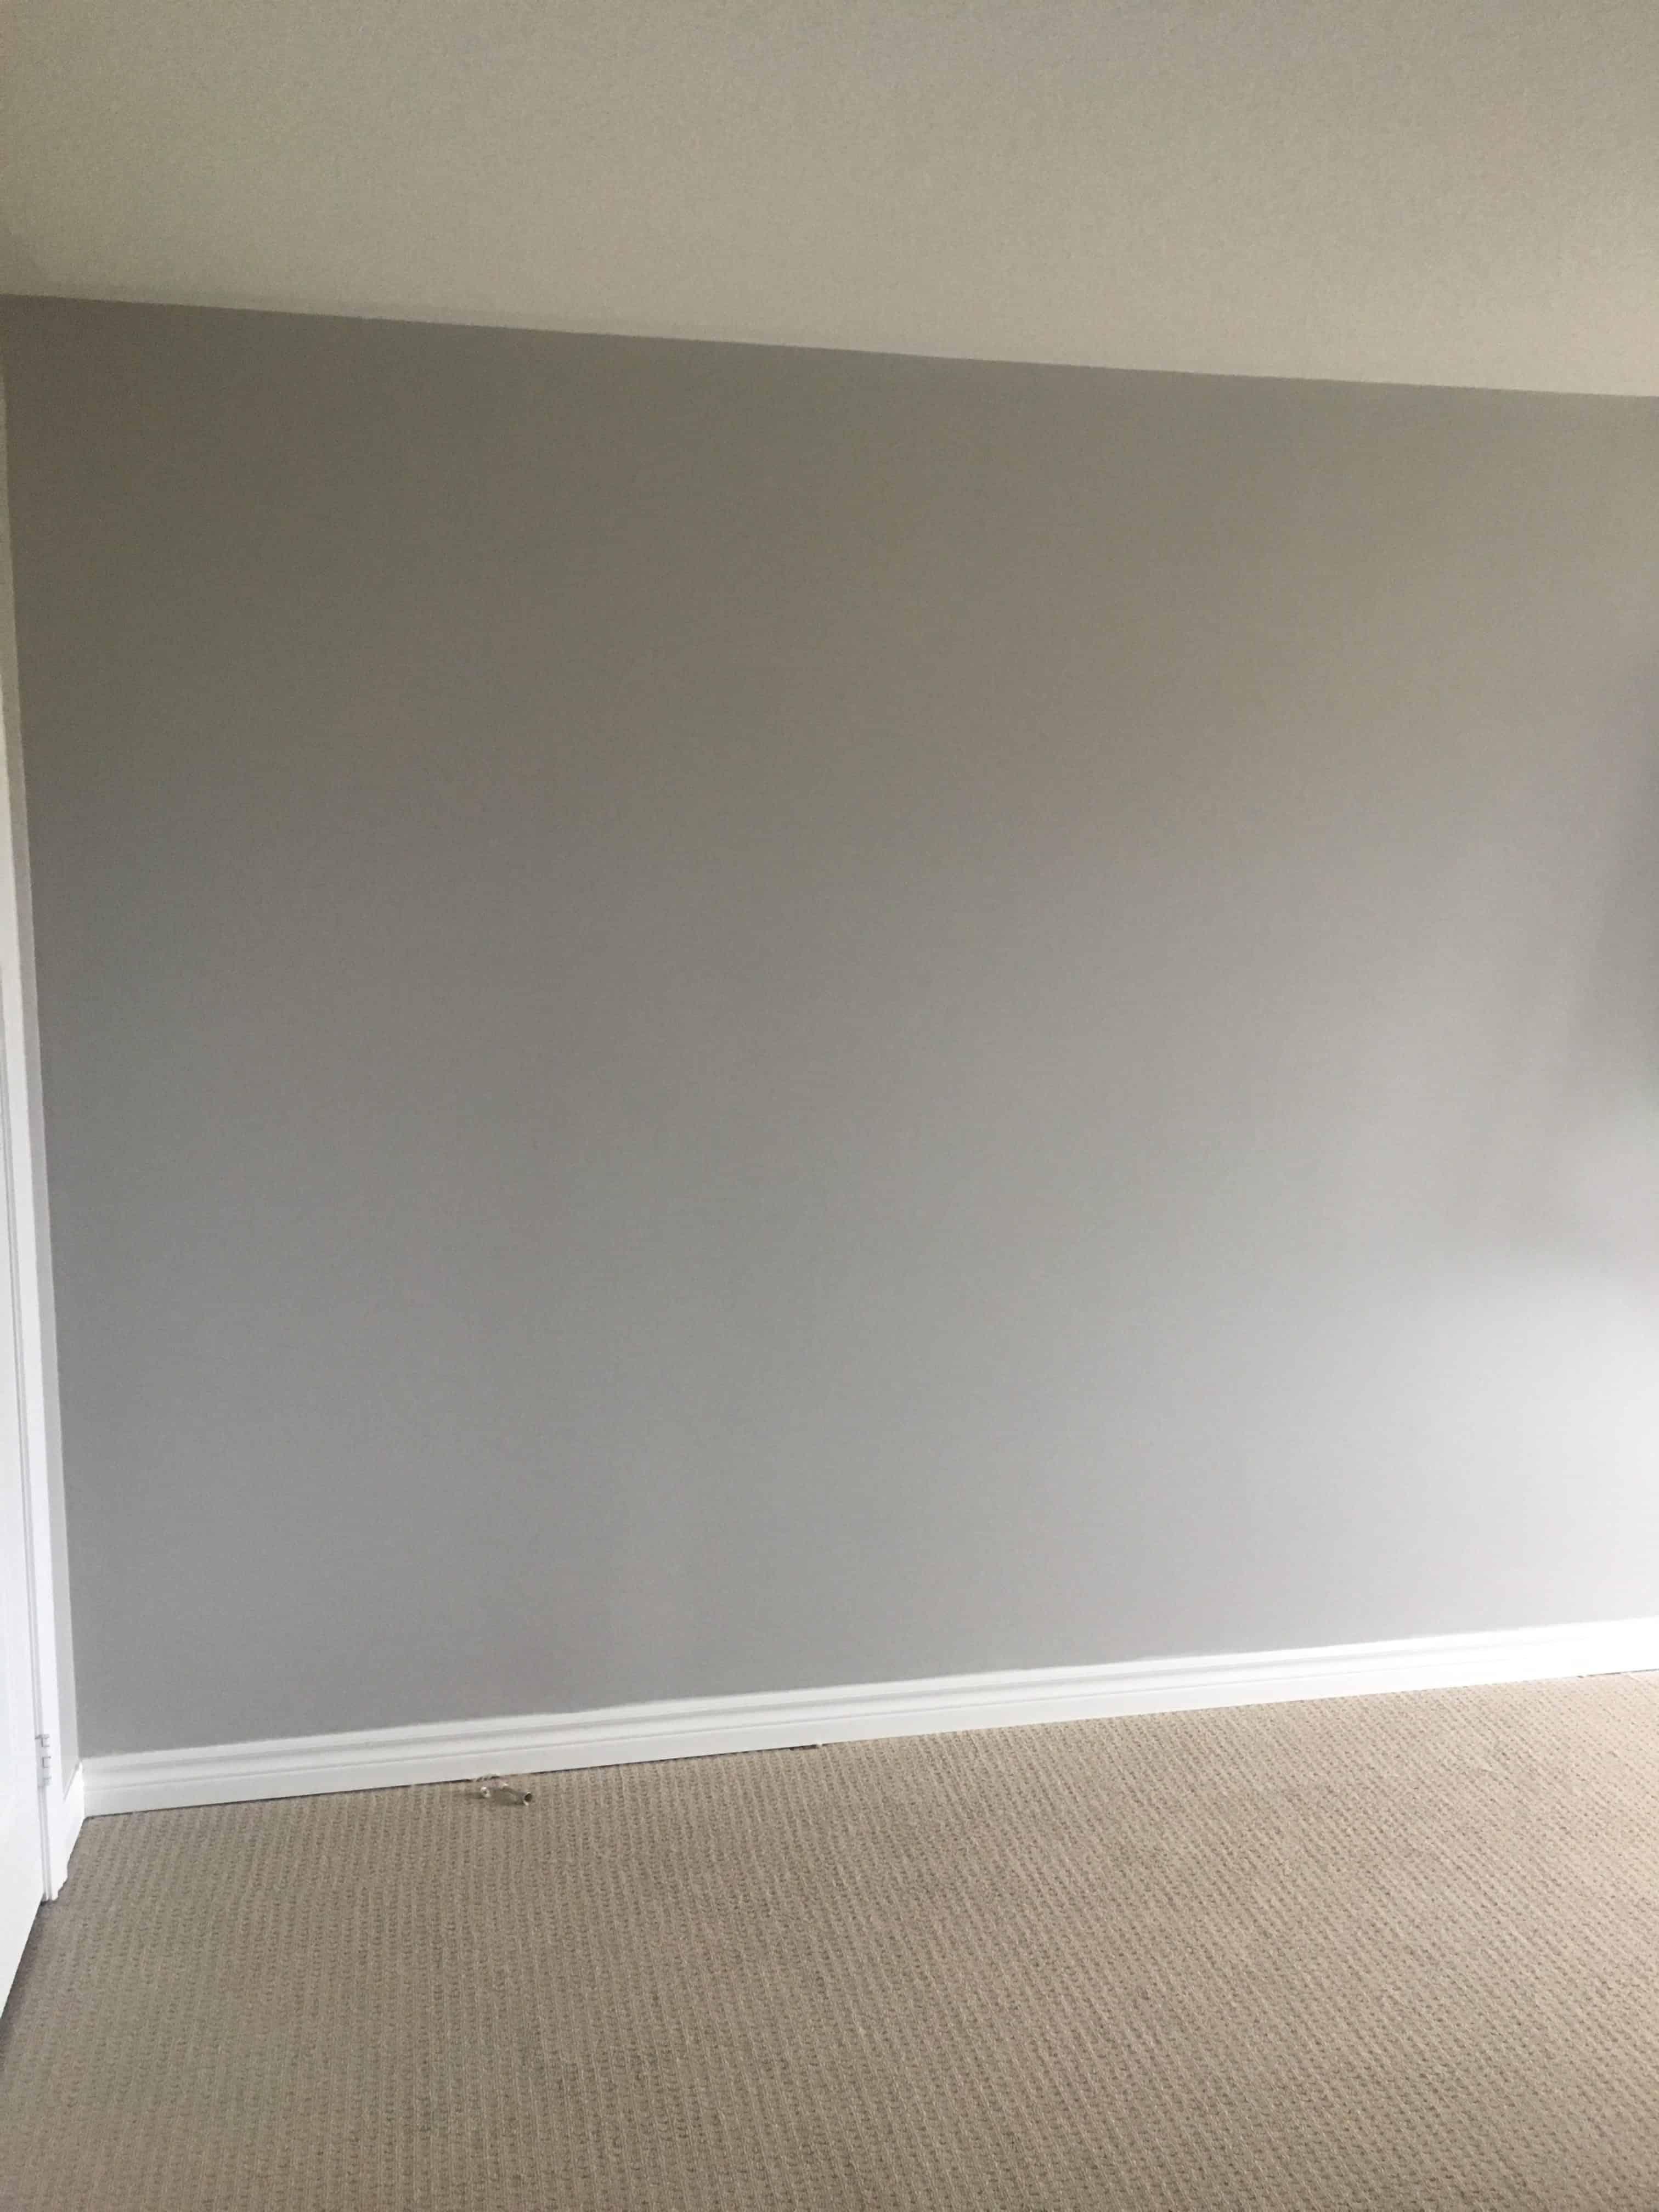 Home improvement, Choosing a Mississauga carpenter